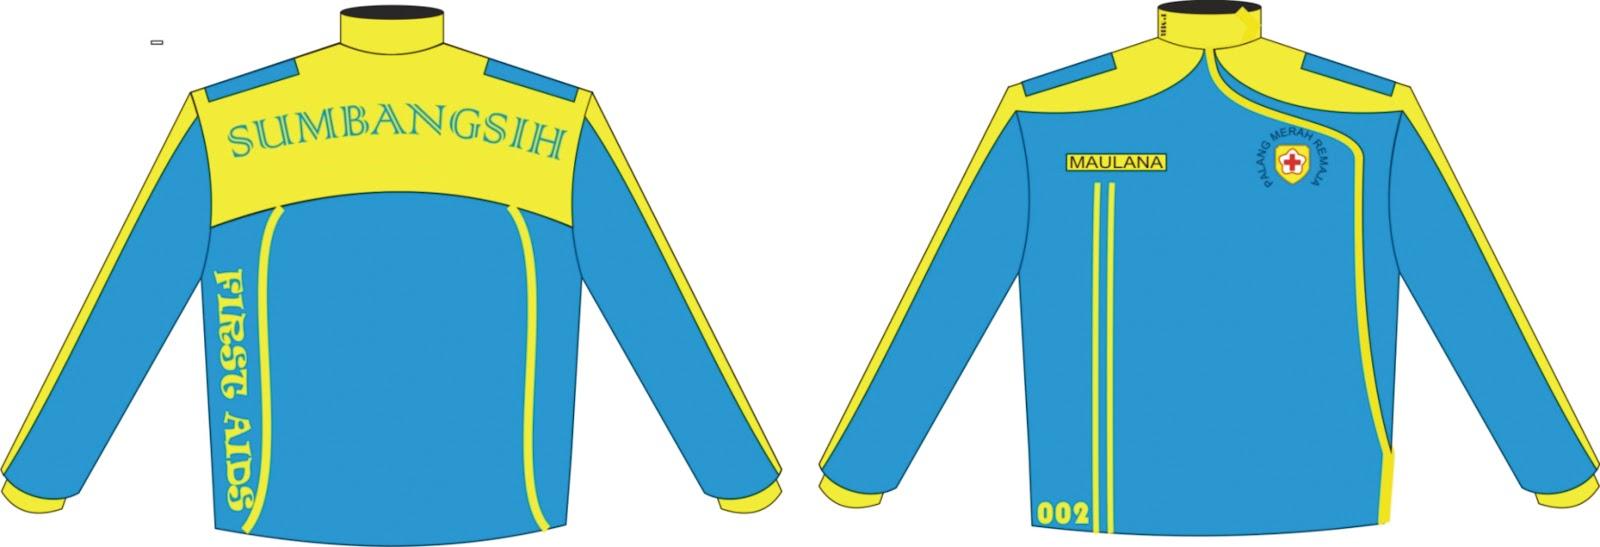 Pertolongan Pertama Baju Dan Kaos Pmr